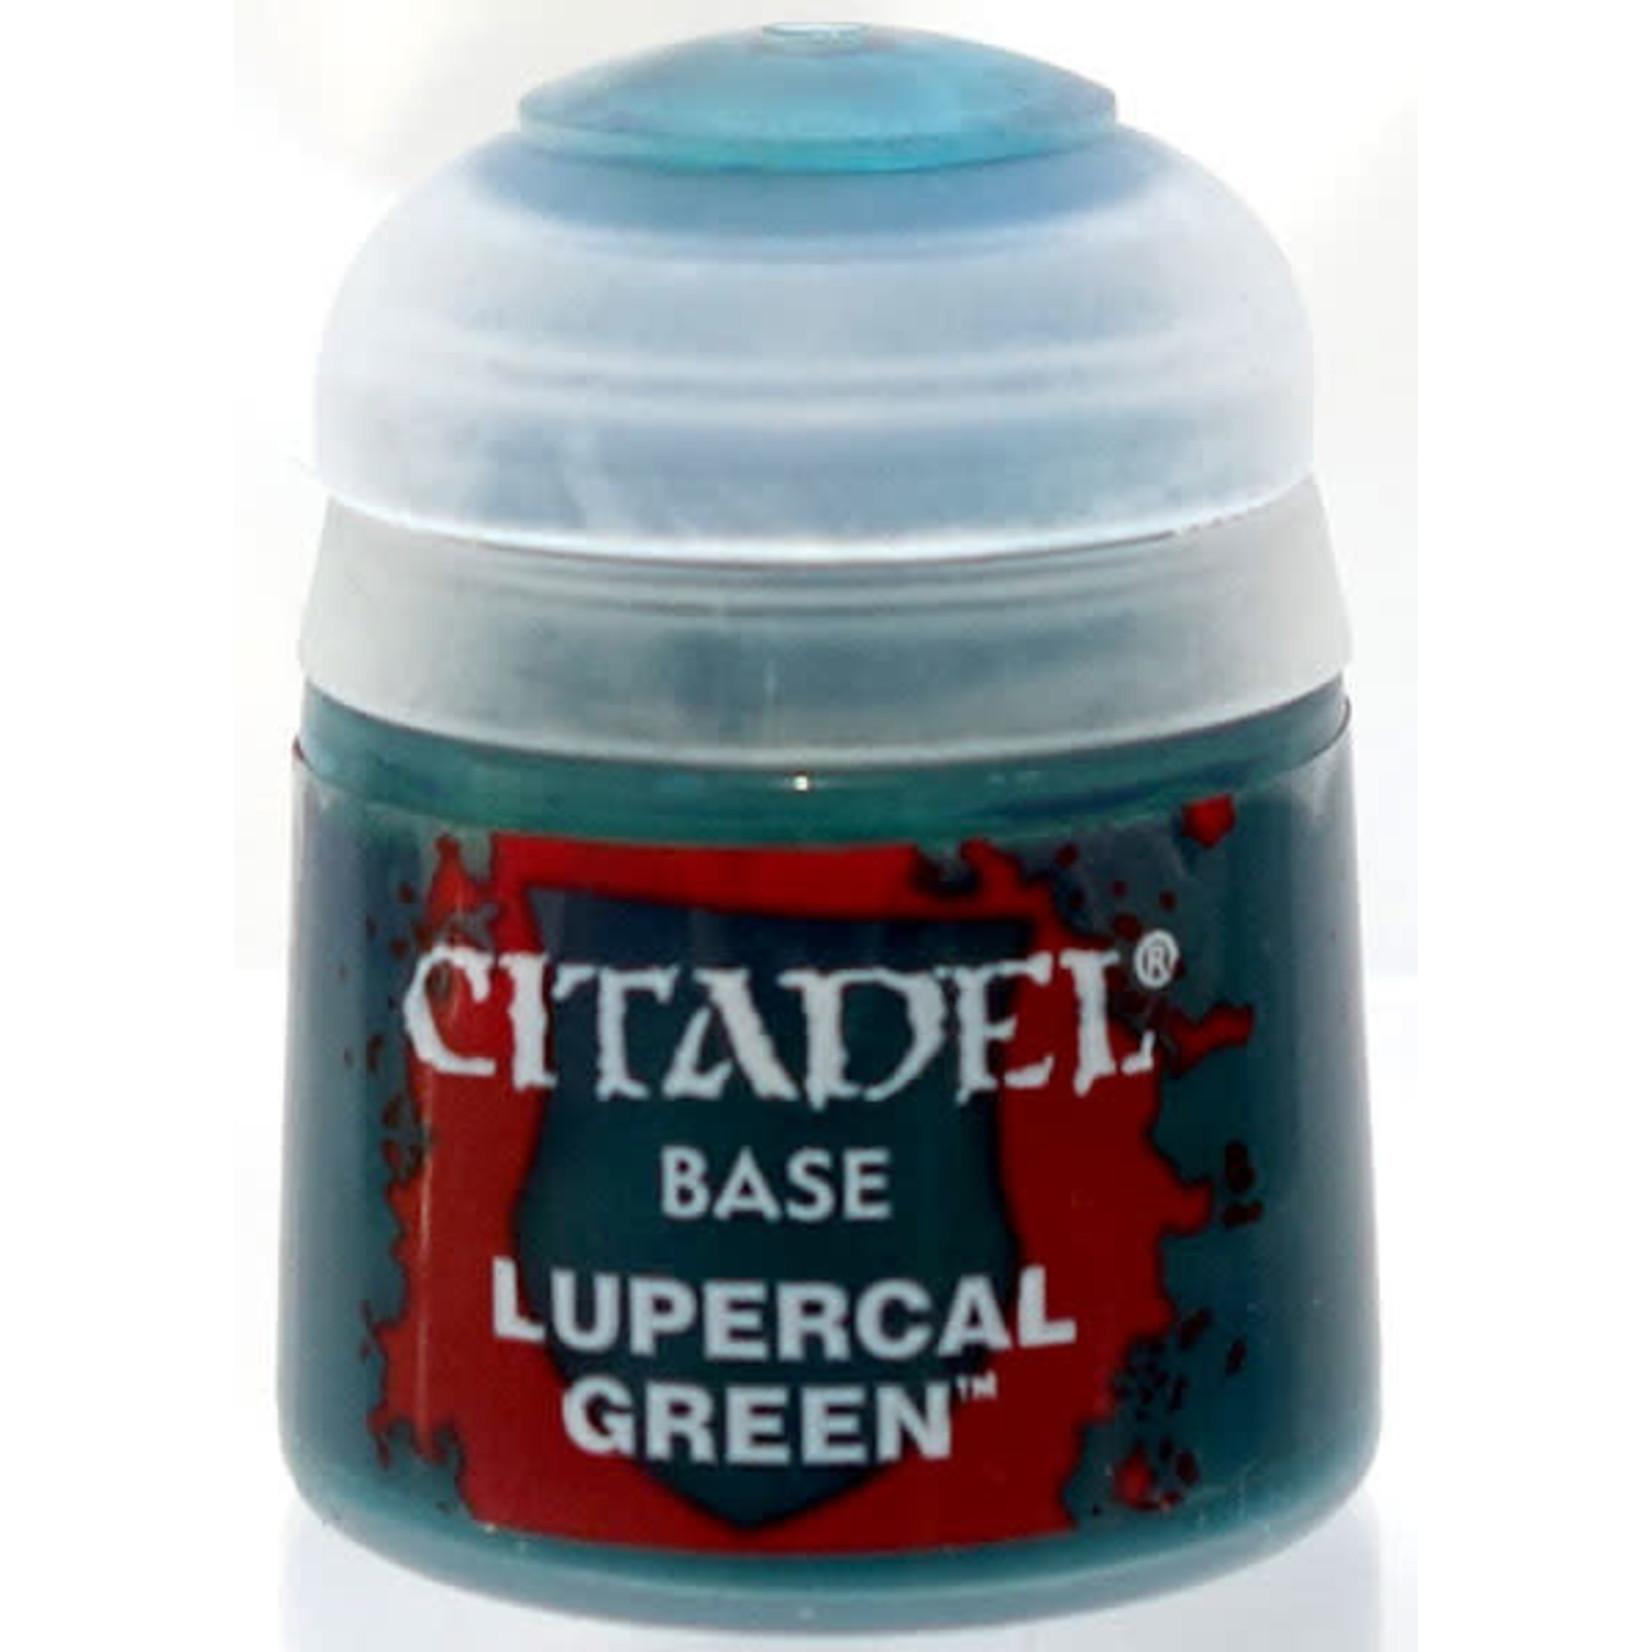 Games Workshop Citadel Paint: Lupercal Green Base 12 ml